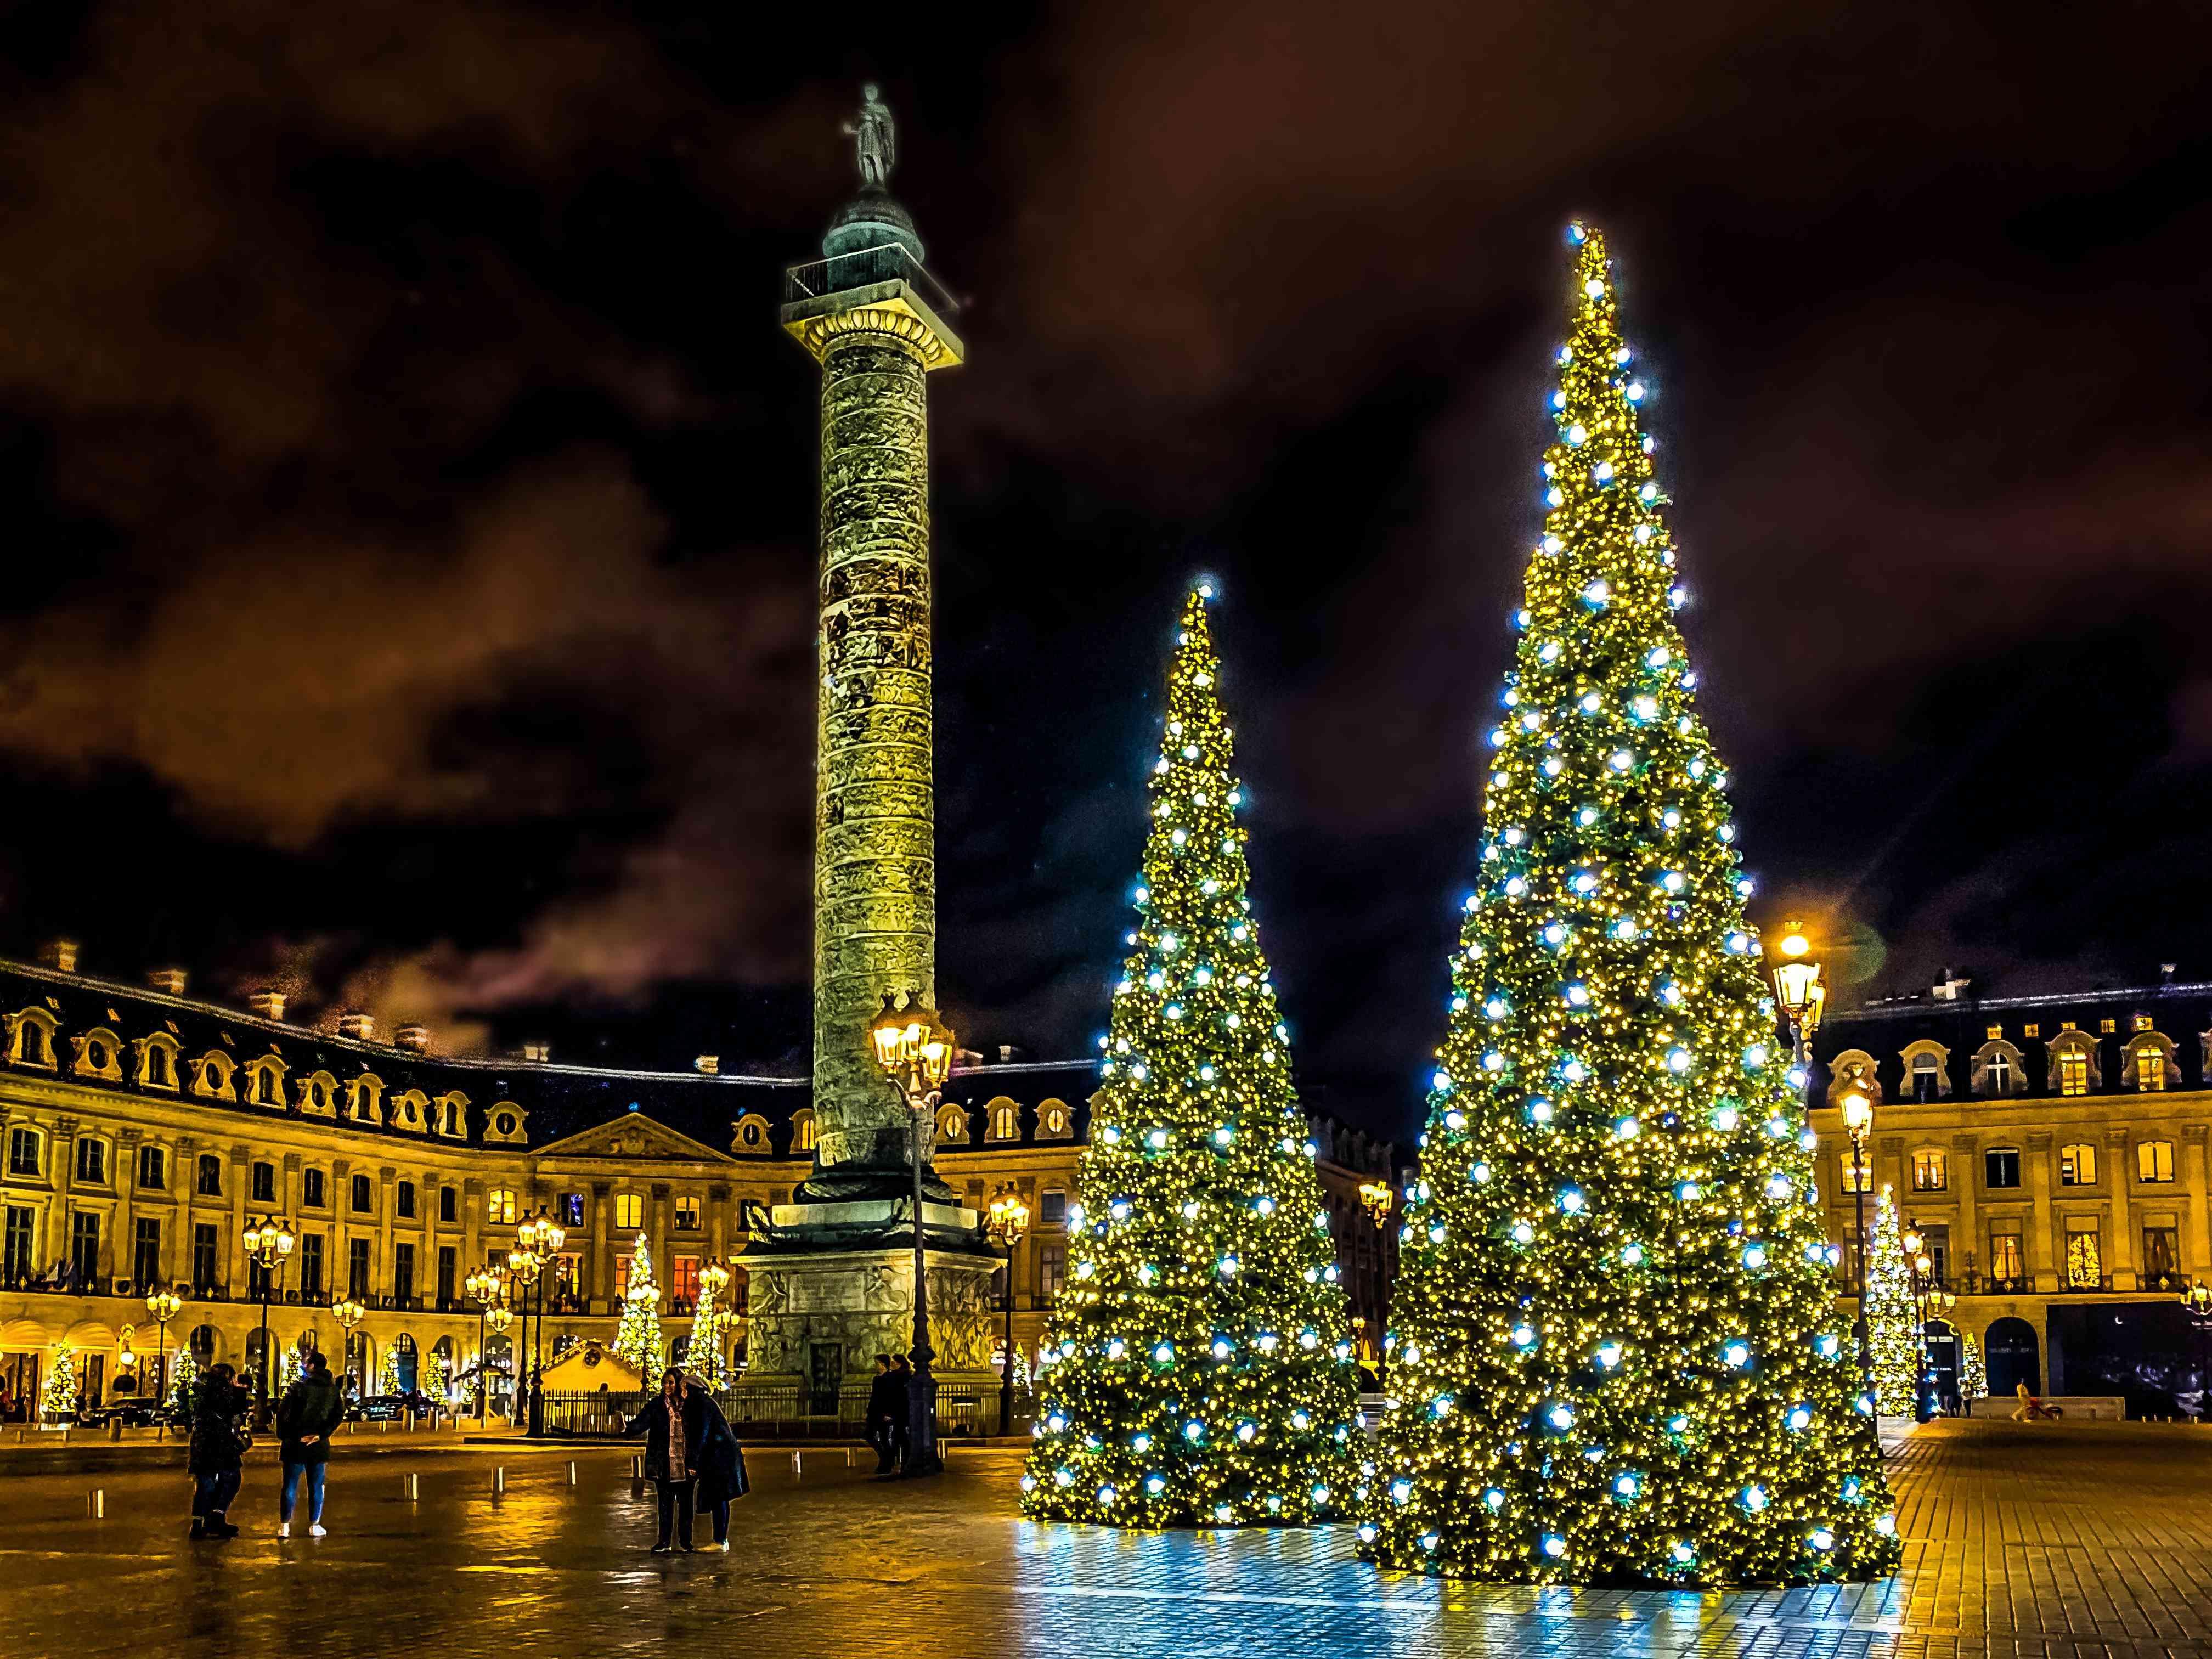 Illuminated Christmas tree at Place Vendome